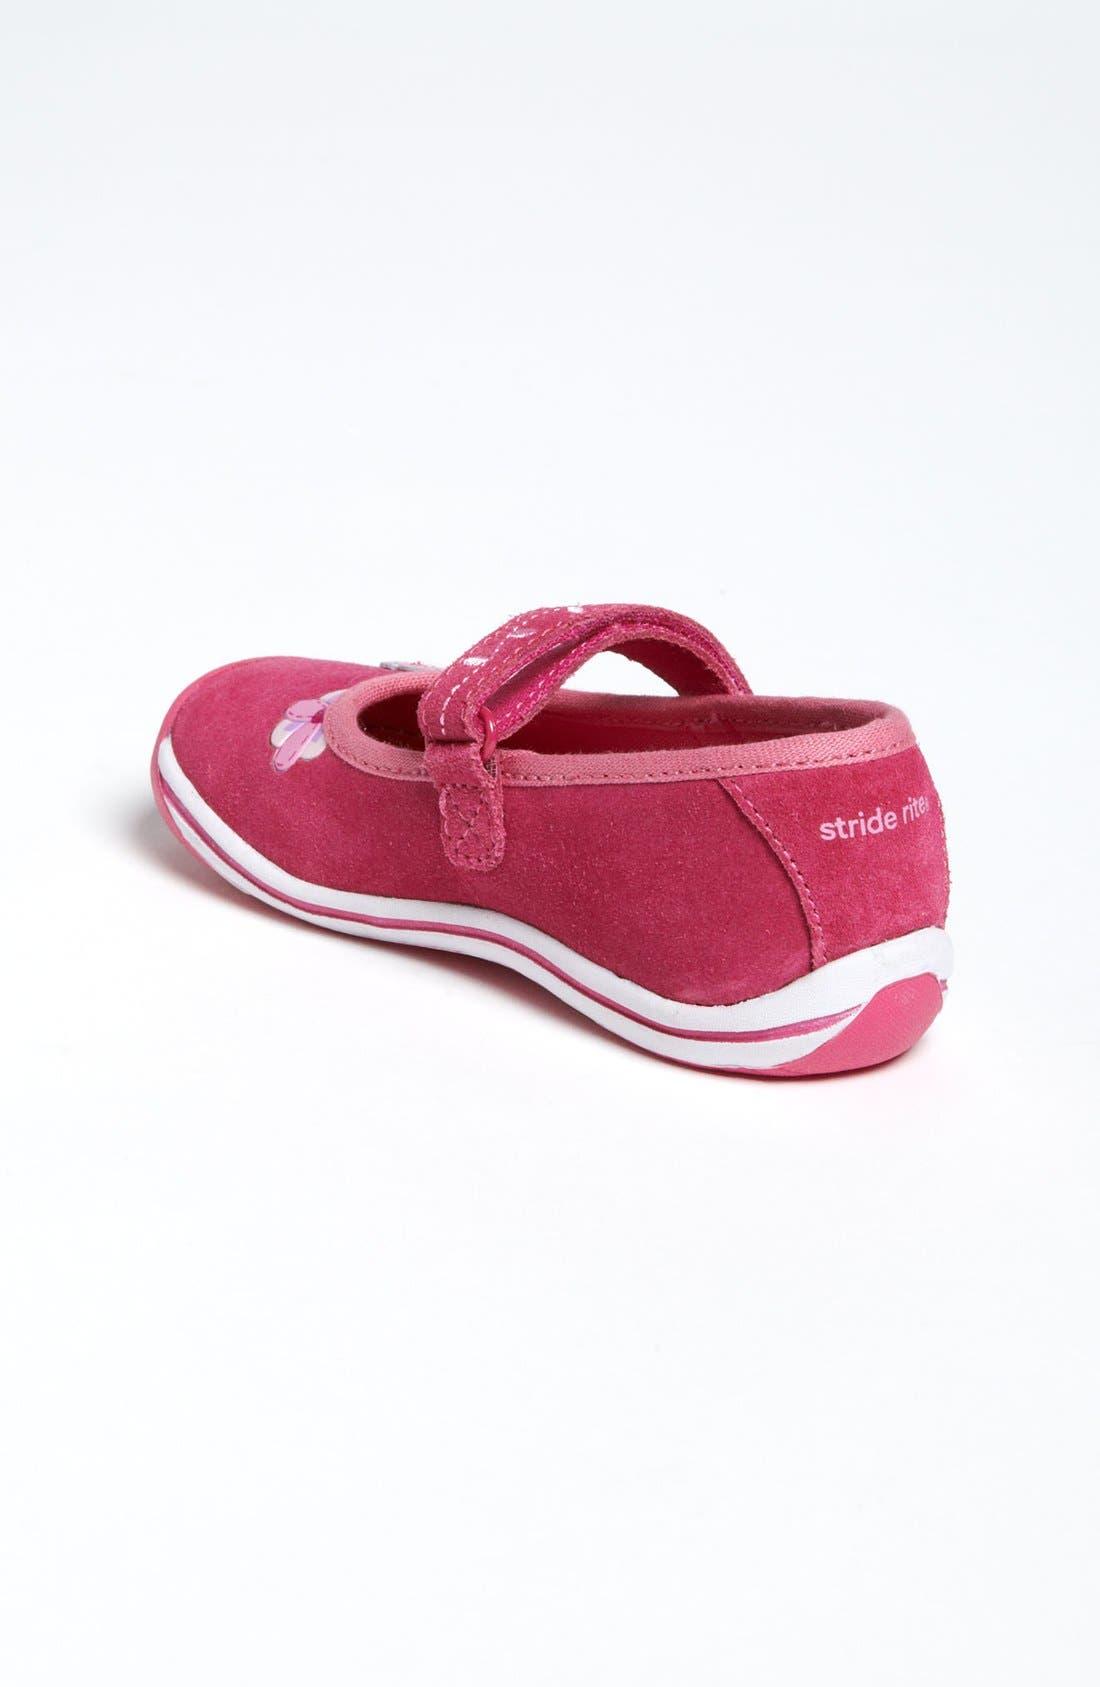 Alternate Image 2  - Stride Rite 'Jessie' Mary Jane Sneaker (Baby, Walker & Toddler)